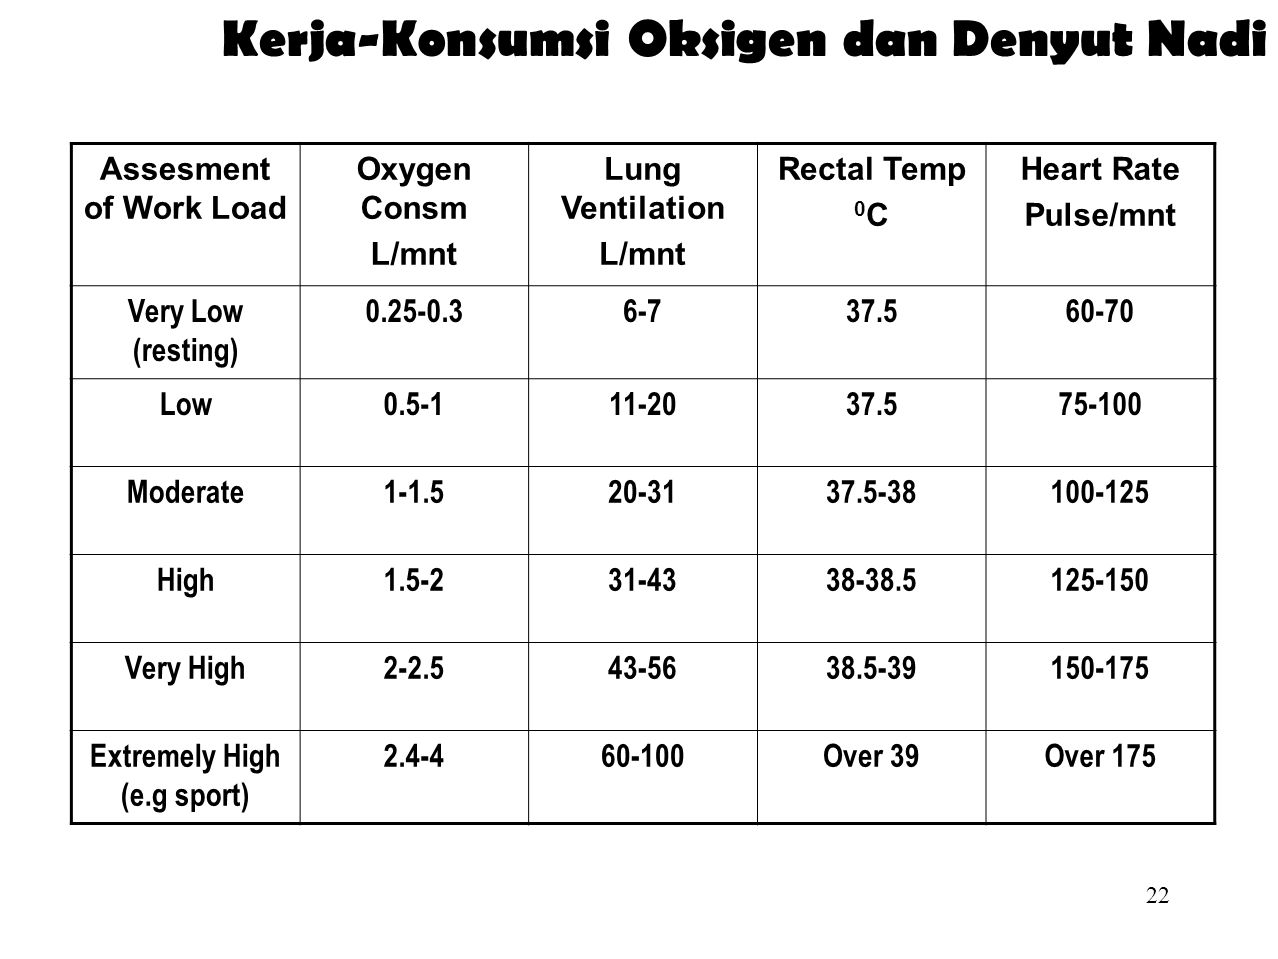 Kerja-Konsumsi Oksigen dan Denyut Nadi